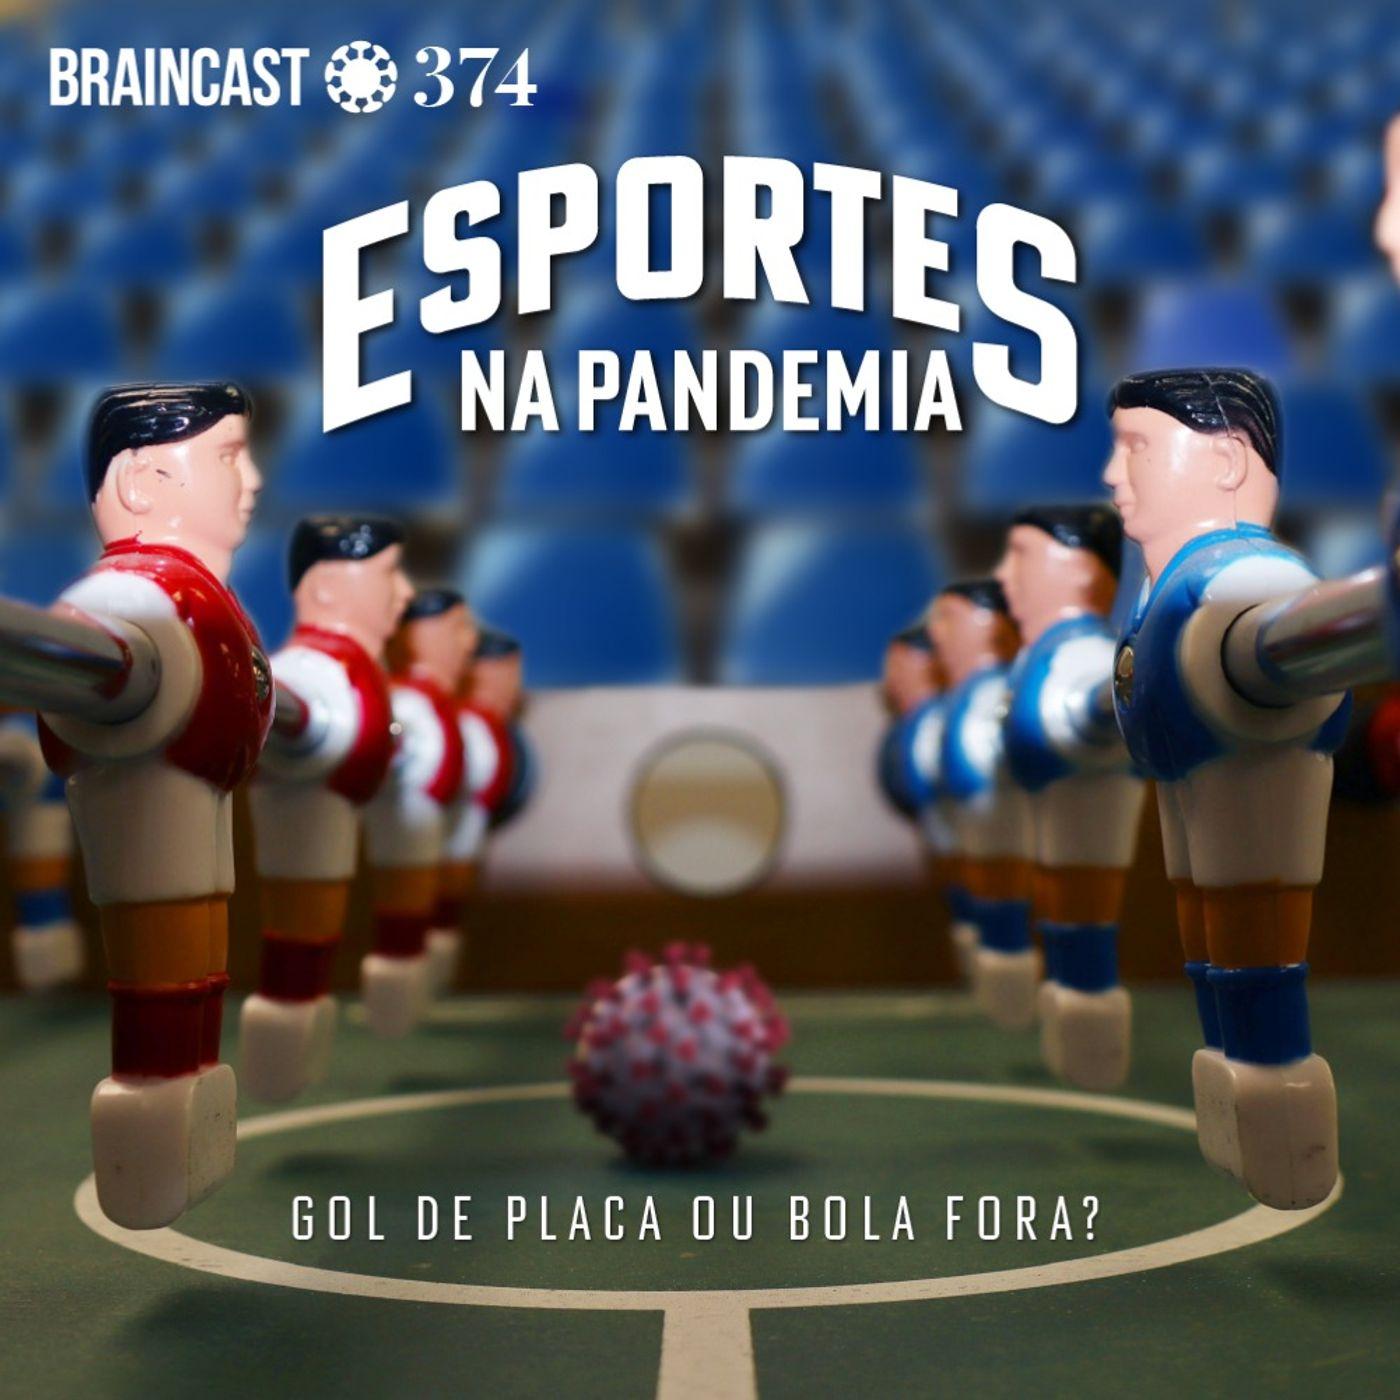 Esportes na pandemia: gol de placa ou bola fora?